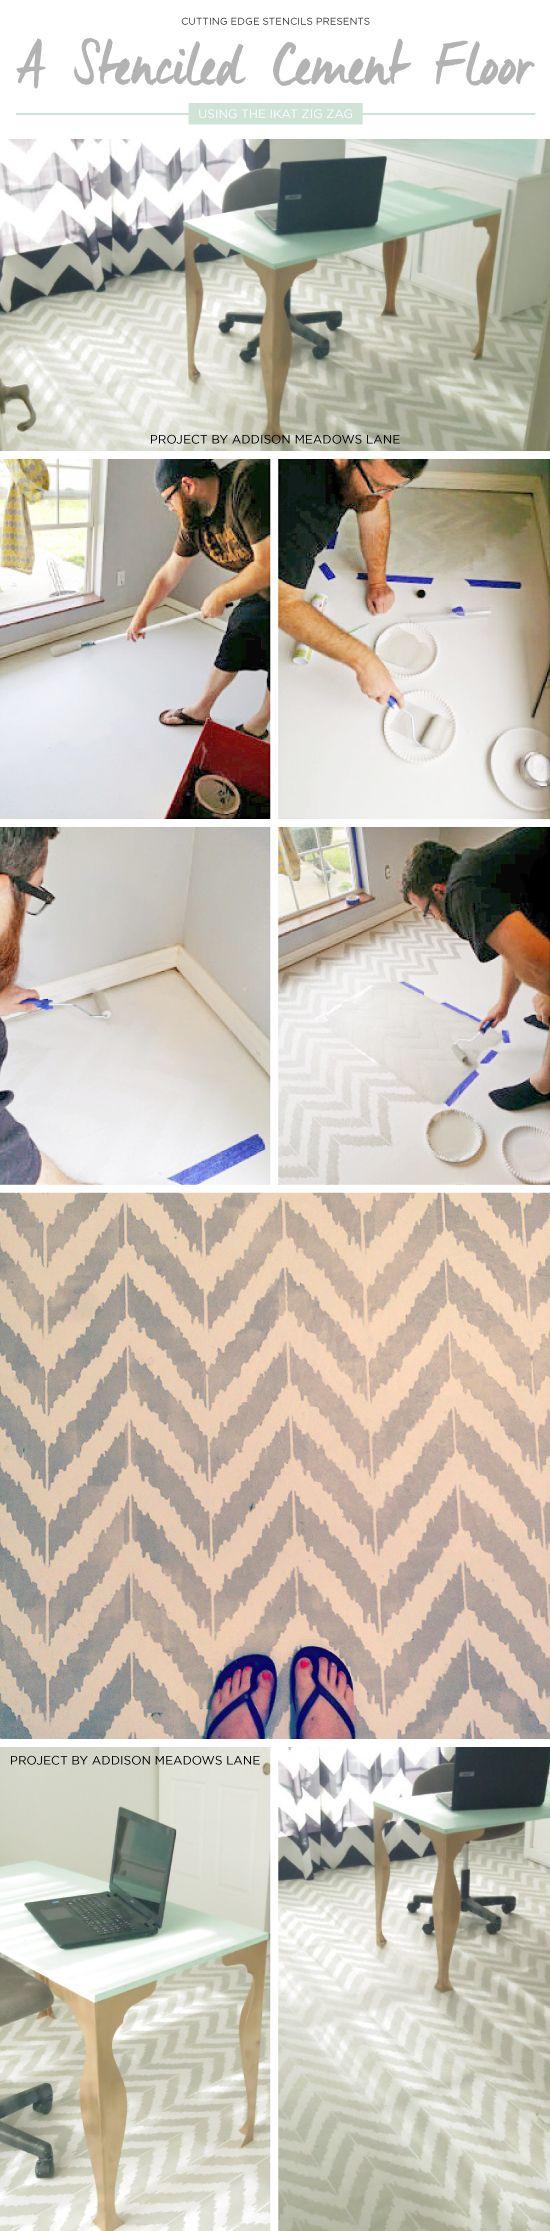 Cutting Edge Stencils shares a DIY painted and stenciled cement floor using the Ikat Zig Zag Stencil. http://www.cuttingedgestencils.com/zigzag-stencil-pattern.html